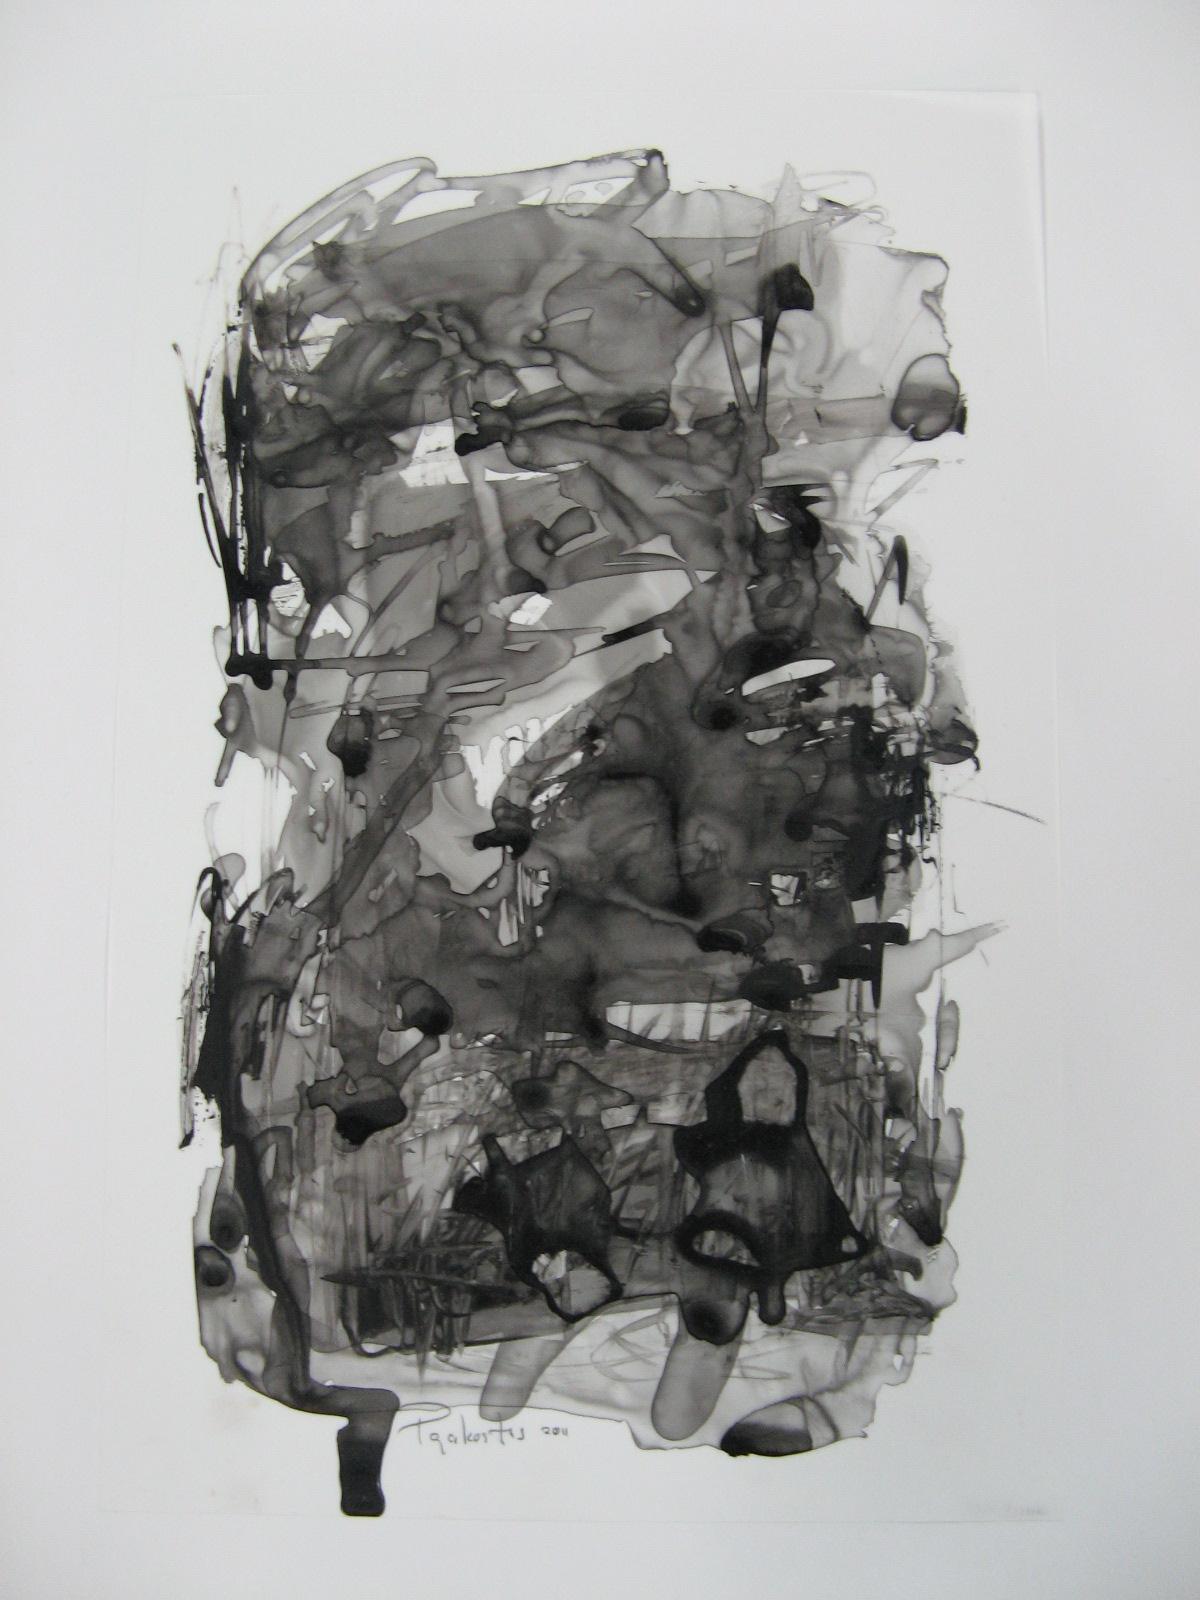 2011 ink on mylar 43.18 x 27.94cm (17 x 11in.) - IMG_1941.JPG